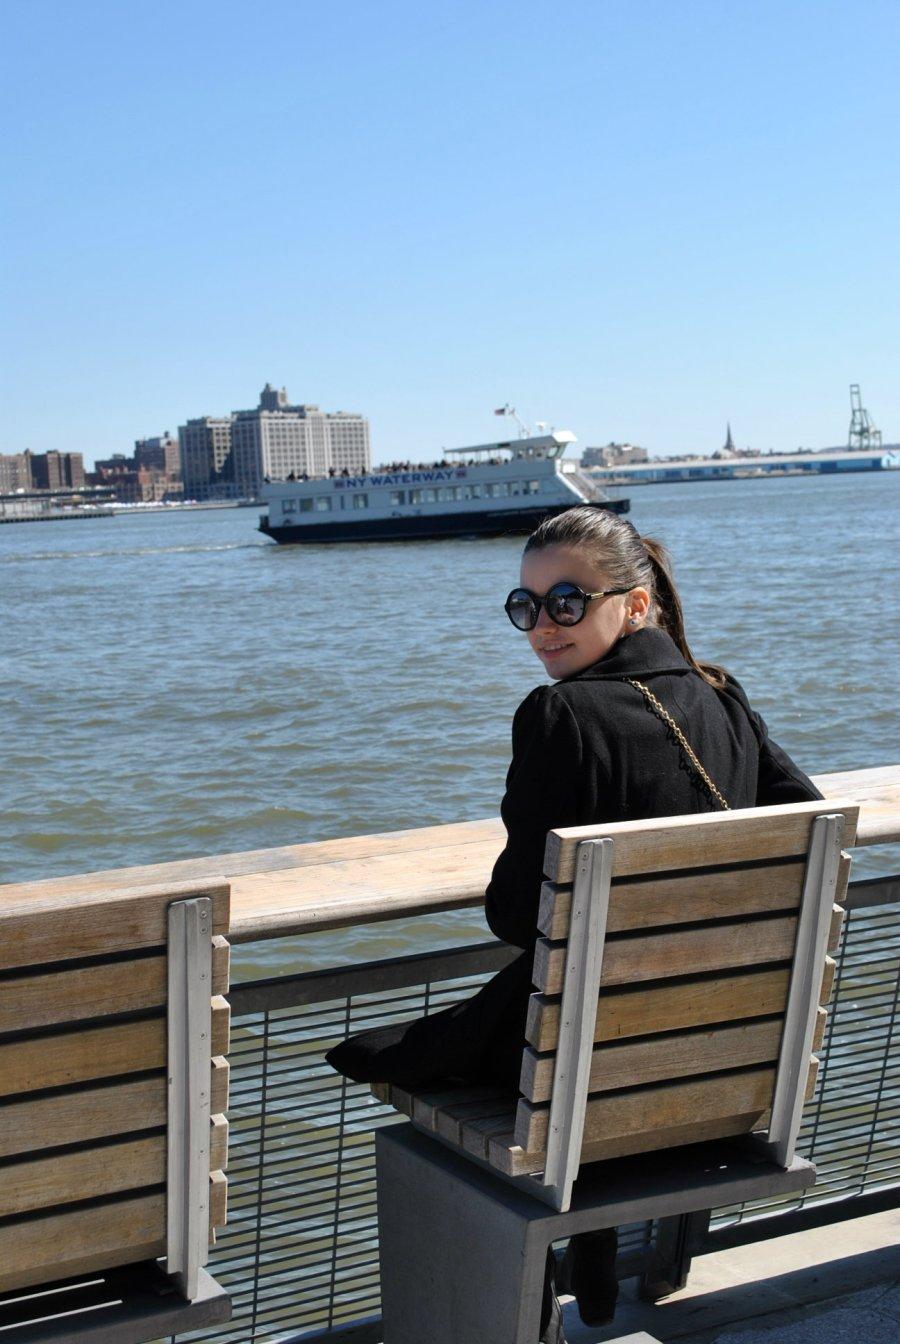 Coat-Bethany Mota for Aeropostale Dress-Forever 21 Sunglasses-Betsey Johnson